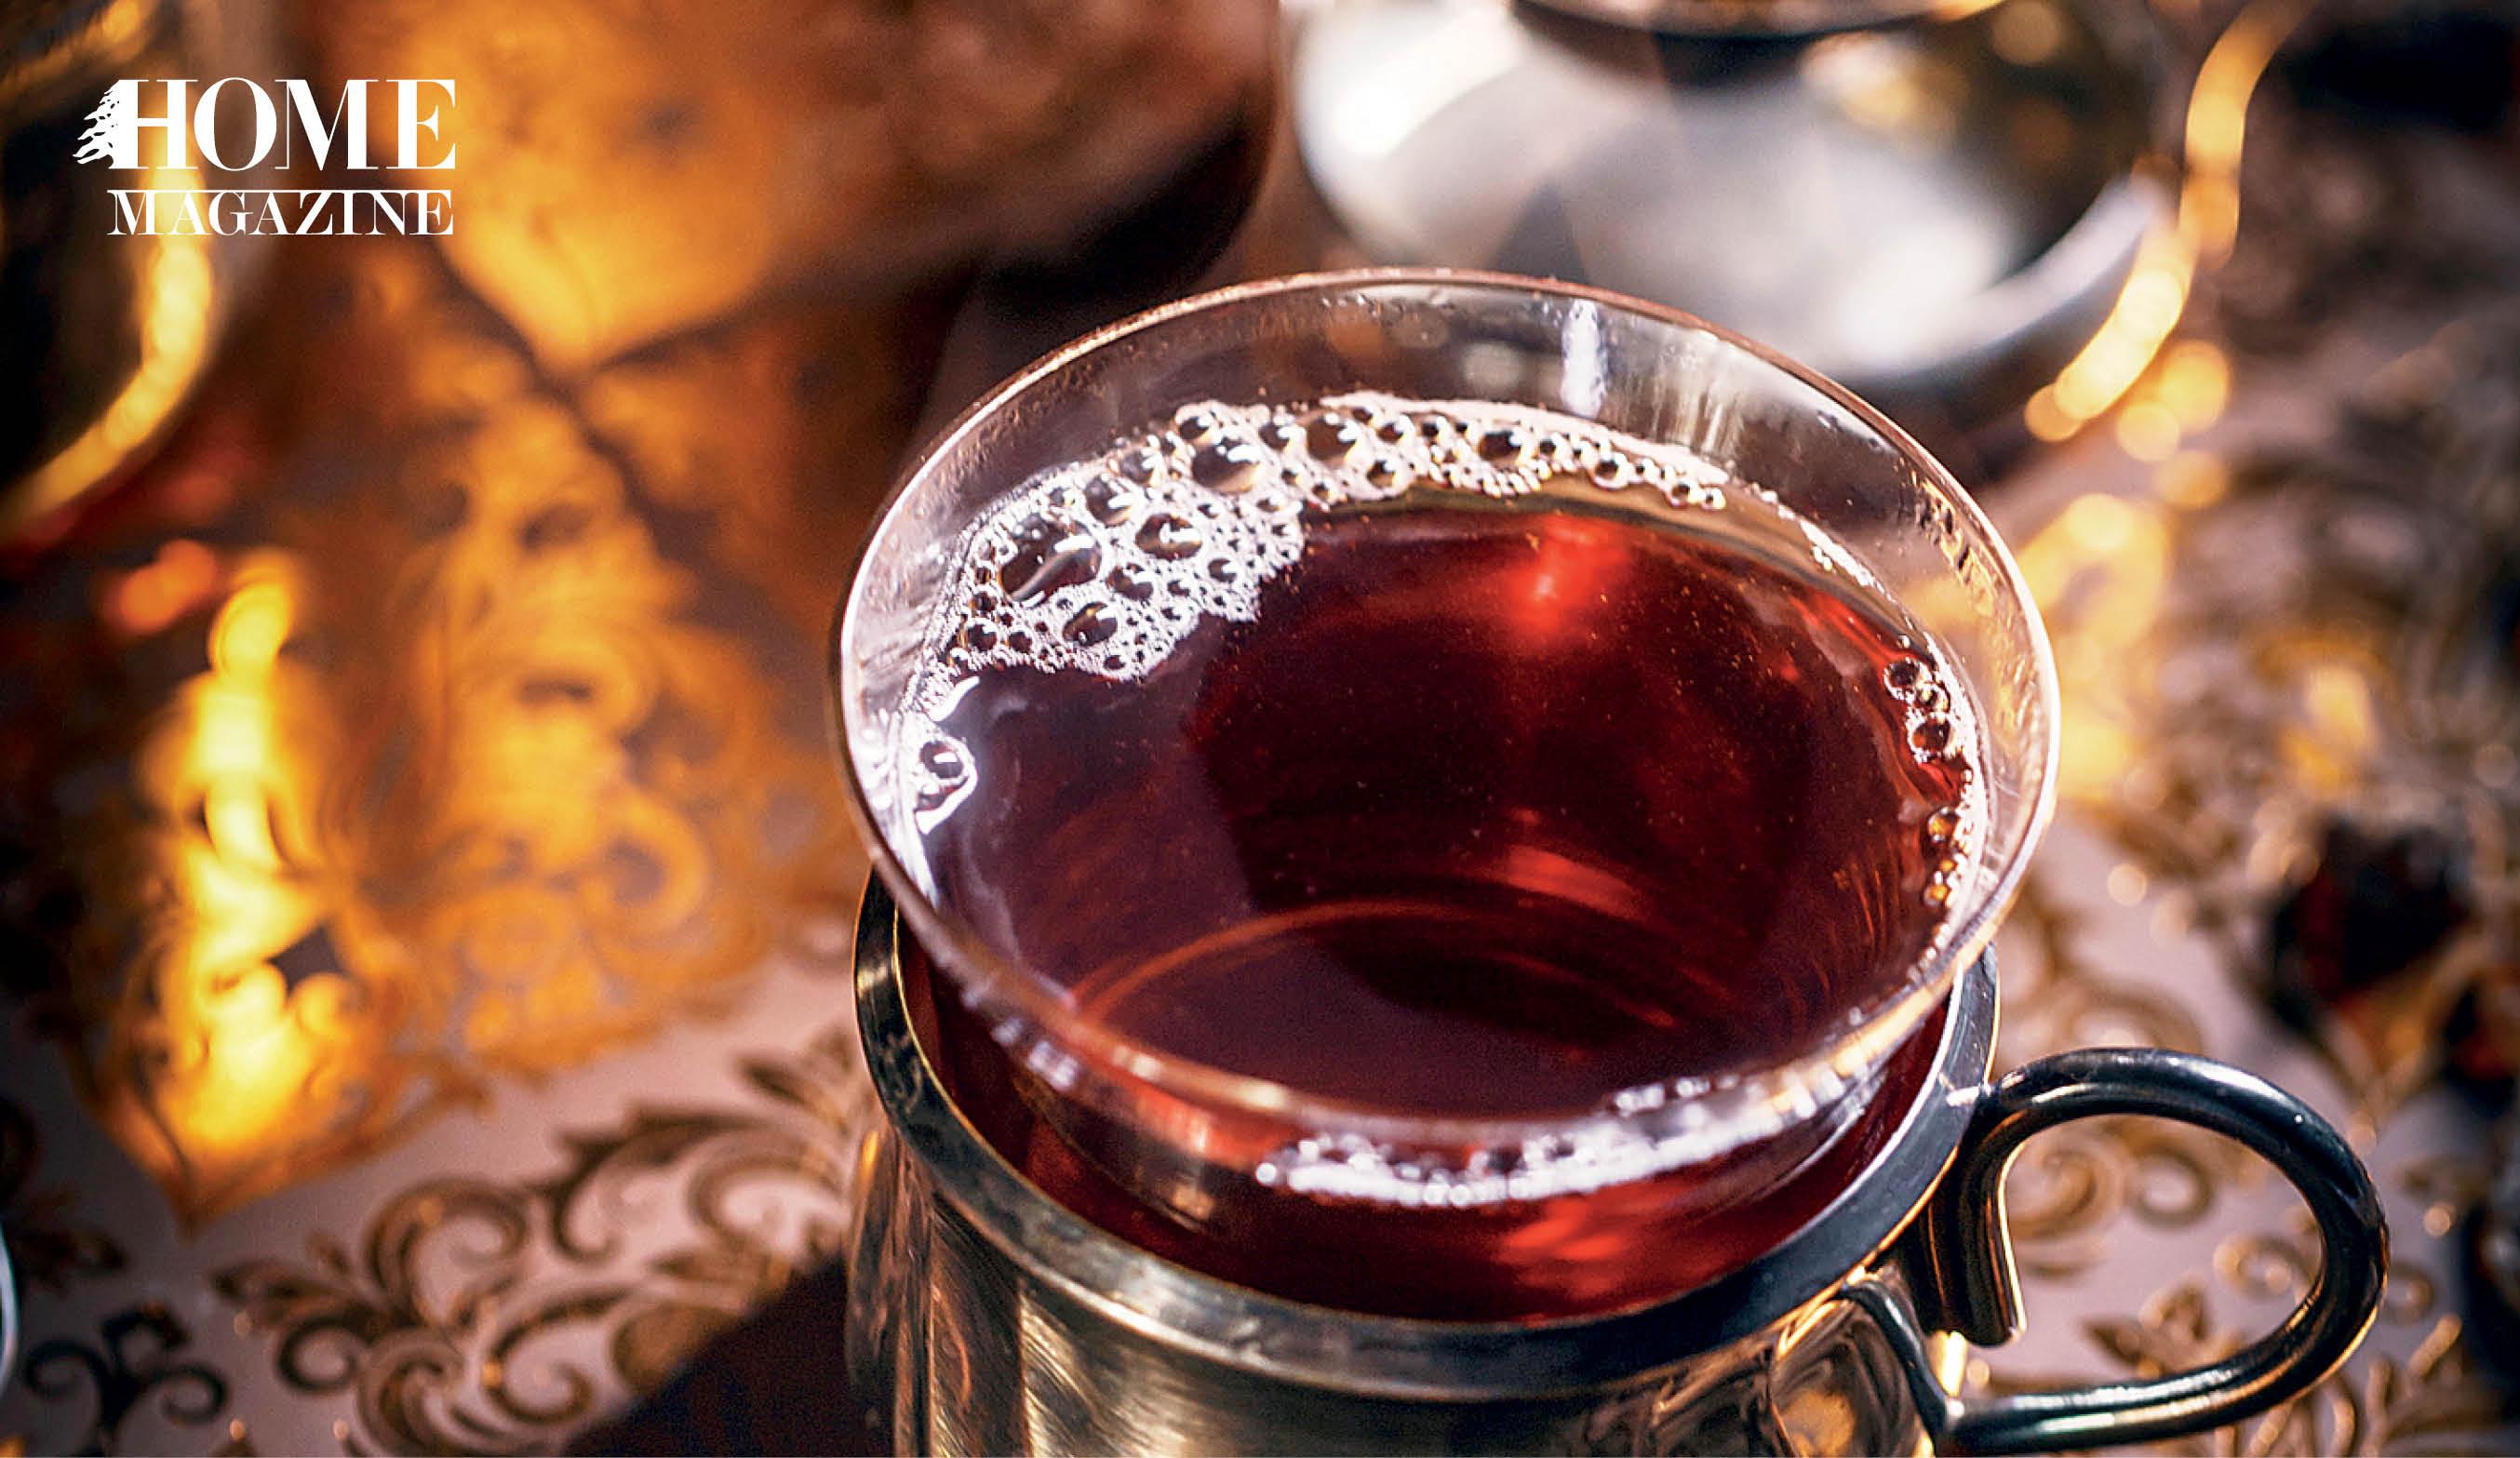 Black tea liquid in a cup